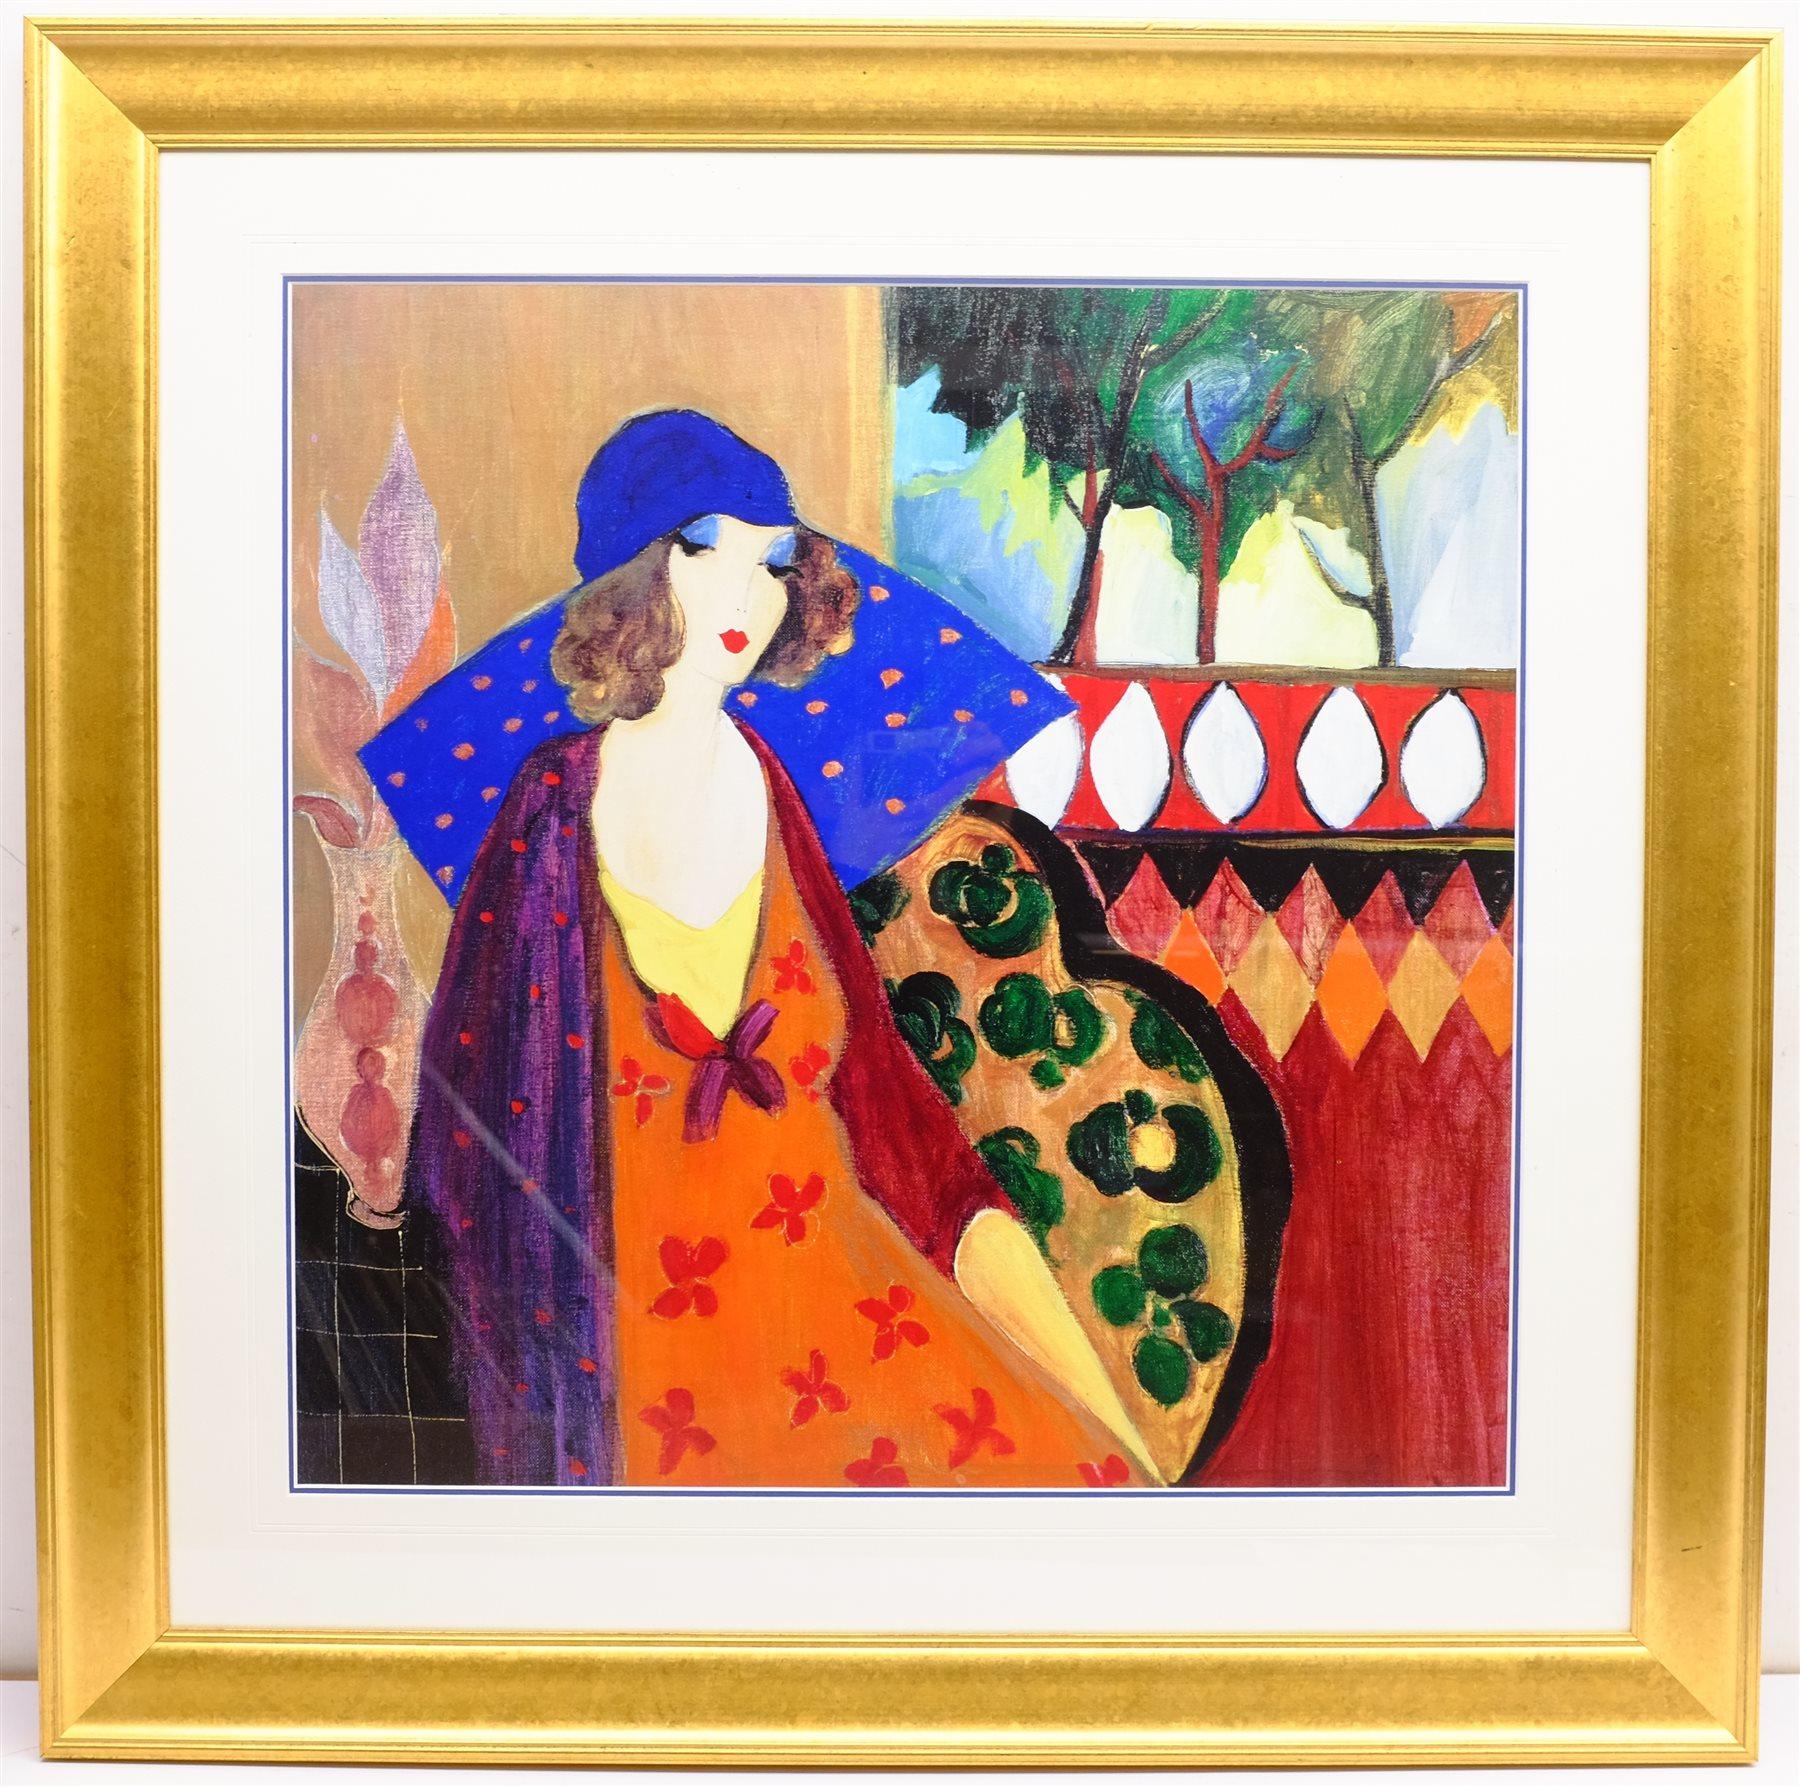 After Itzchak Tarkay (Israeli 1935-2012): 'Indigo Chapeau', colour print 63cm x 64cm - Image 3 of 4